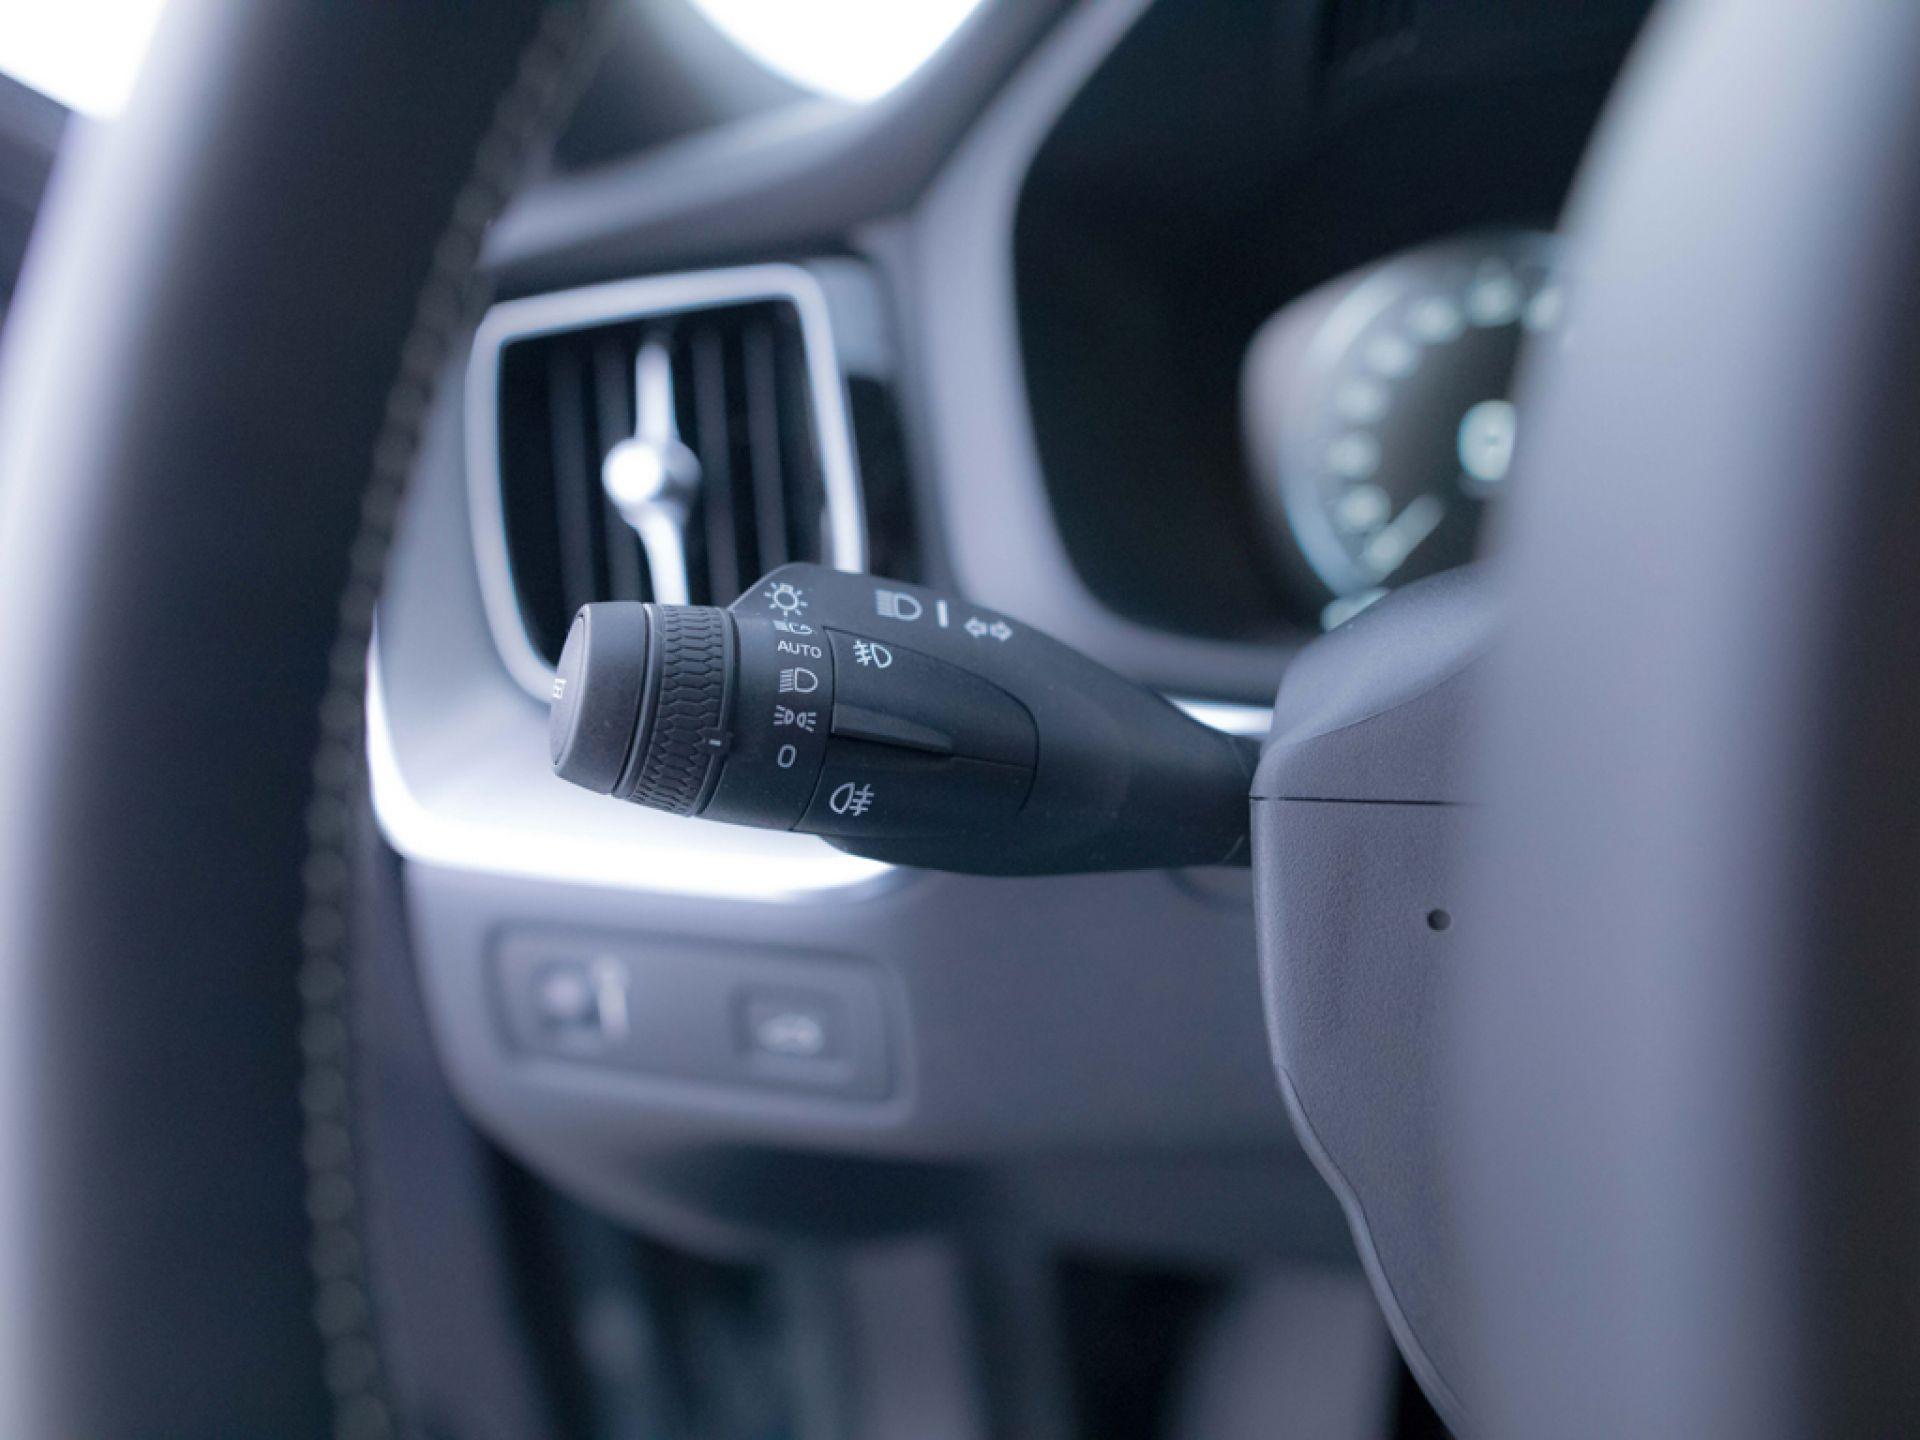 Volvo XC60 2.0 D4 R-Design Auto